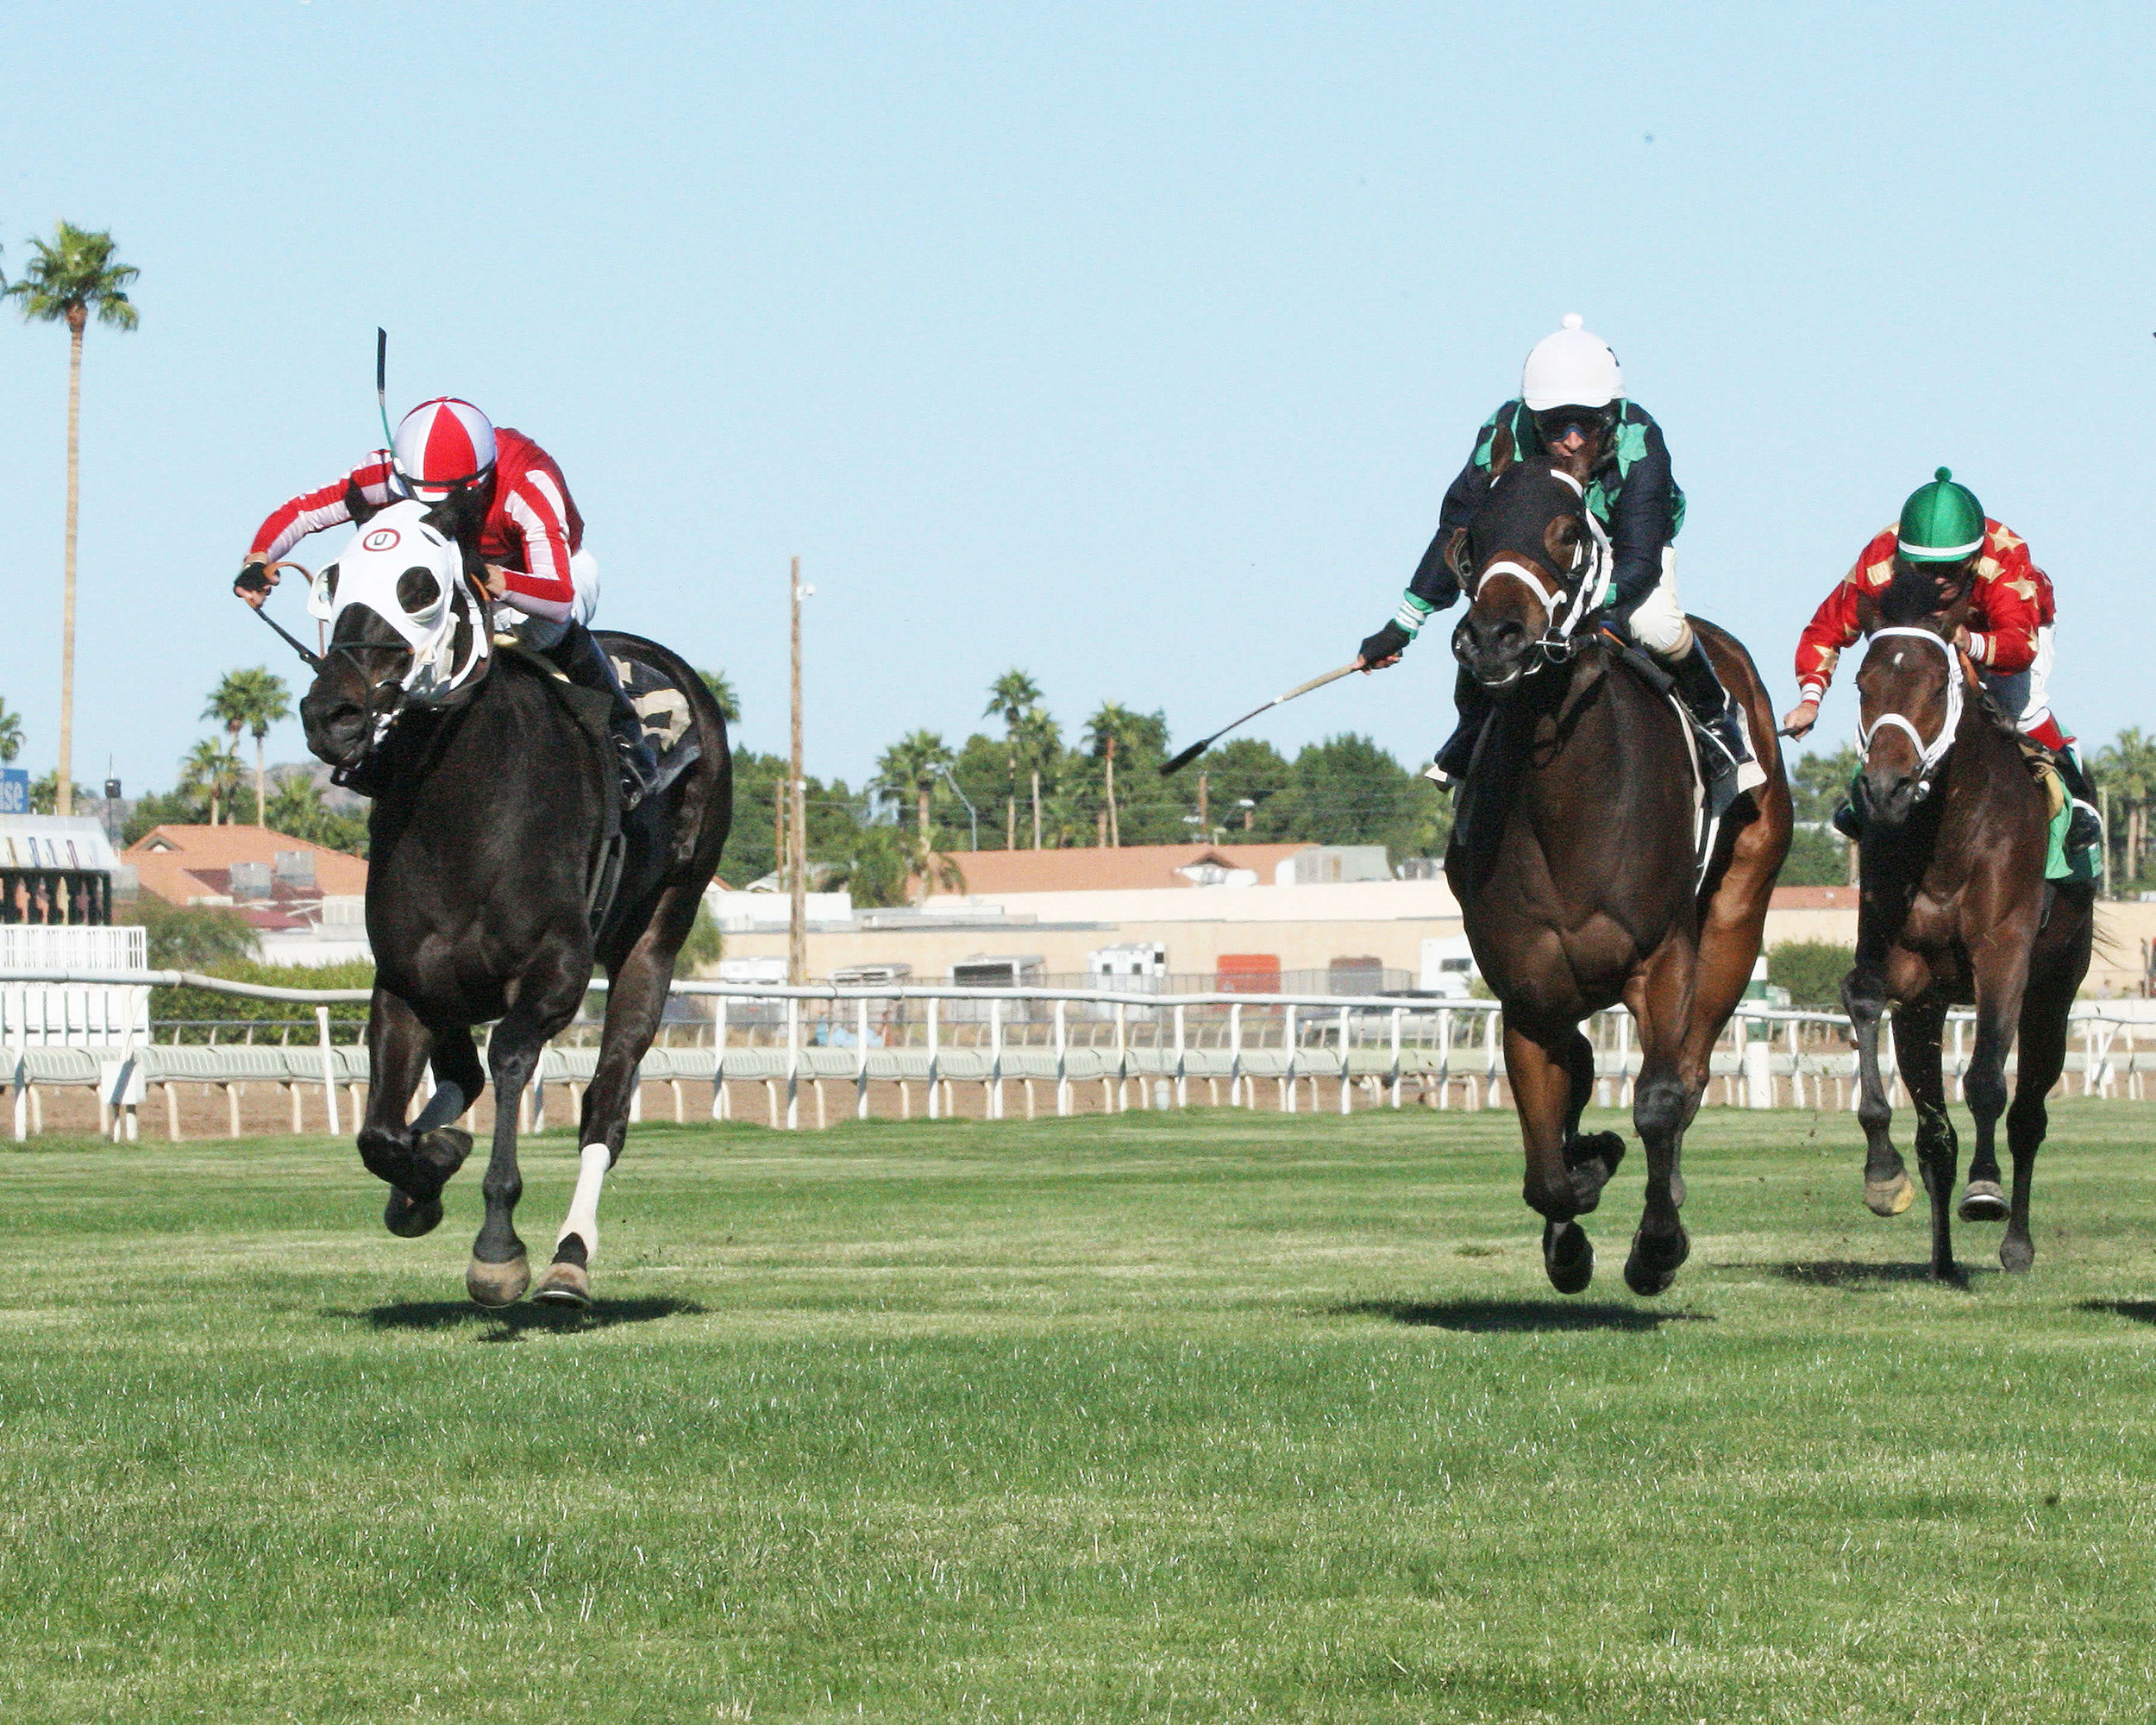 Twelve Tribes - Jeff & Jack Coady, Sr Stakes - 11-08-14 - R05 - TUP - Under Rail Finish (1).jpg